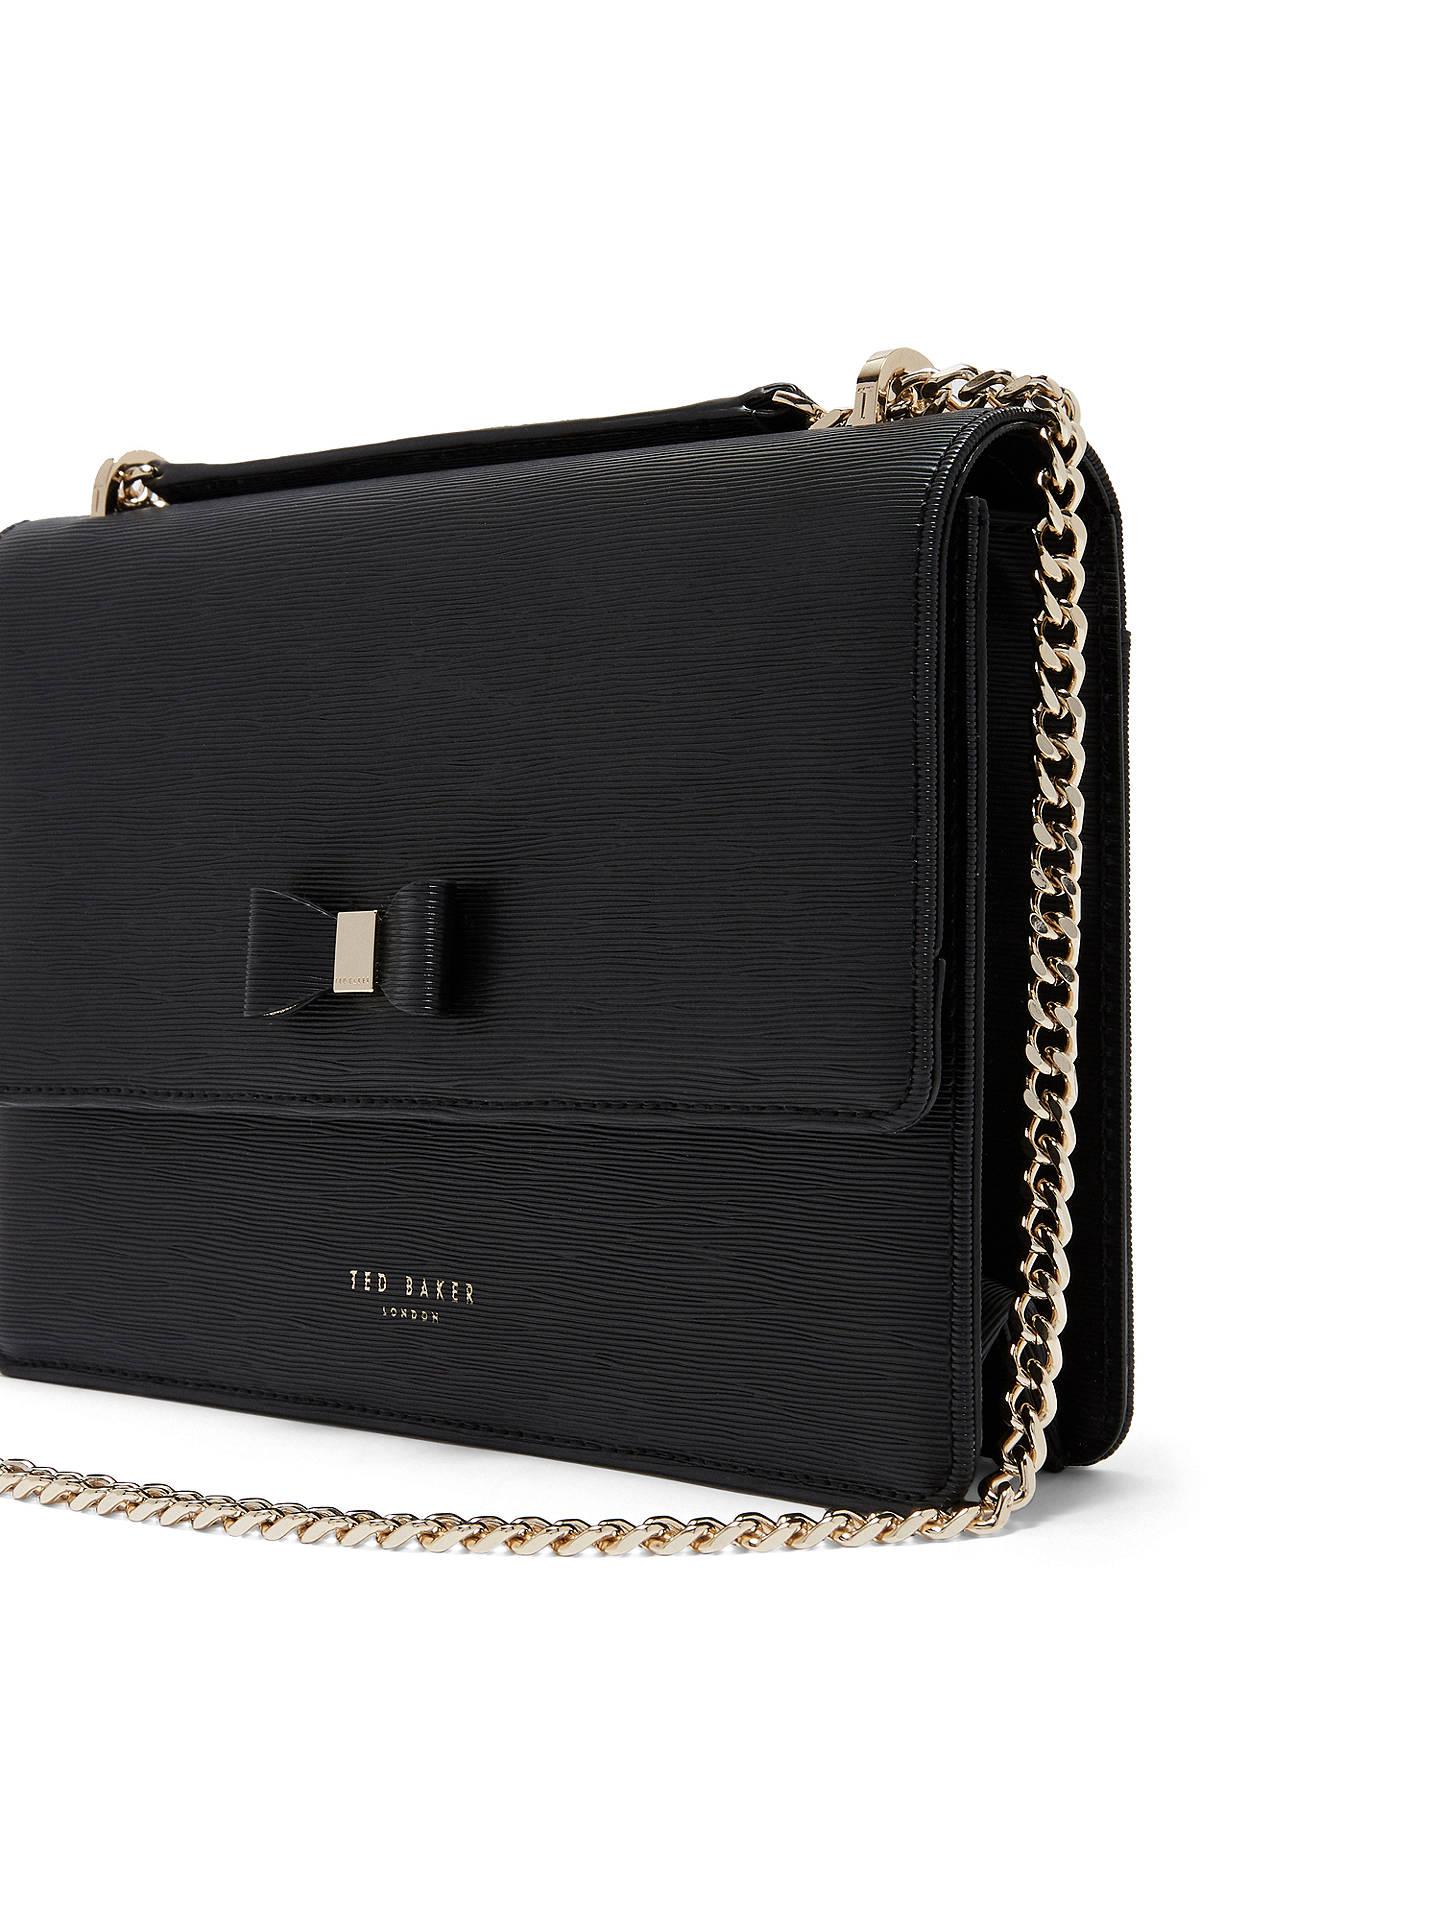 a1d4525bd128 ... Buy Ted Baker Delila Bow Leather Cross Body Bag, Black Online at  johnlewis.com